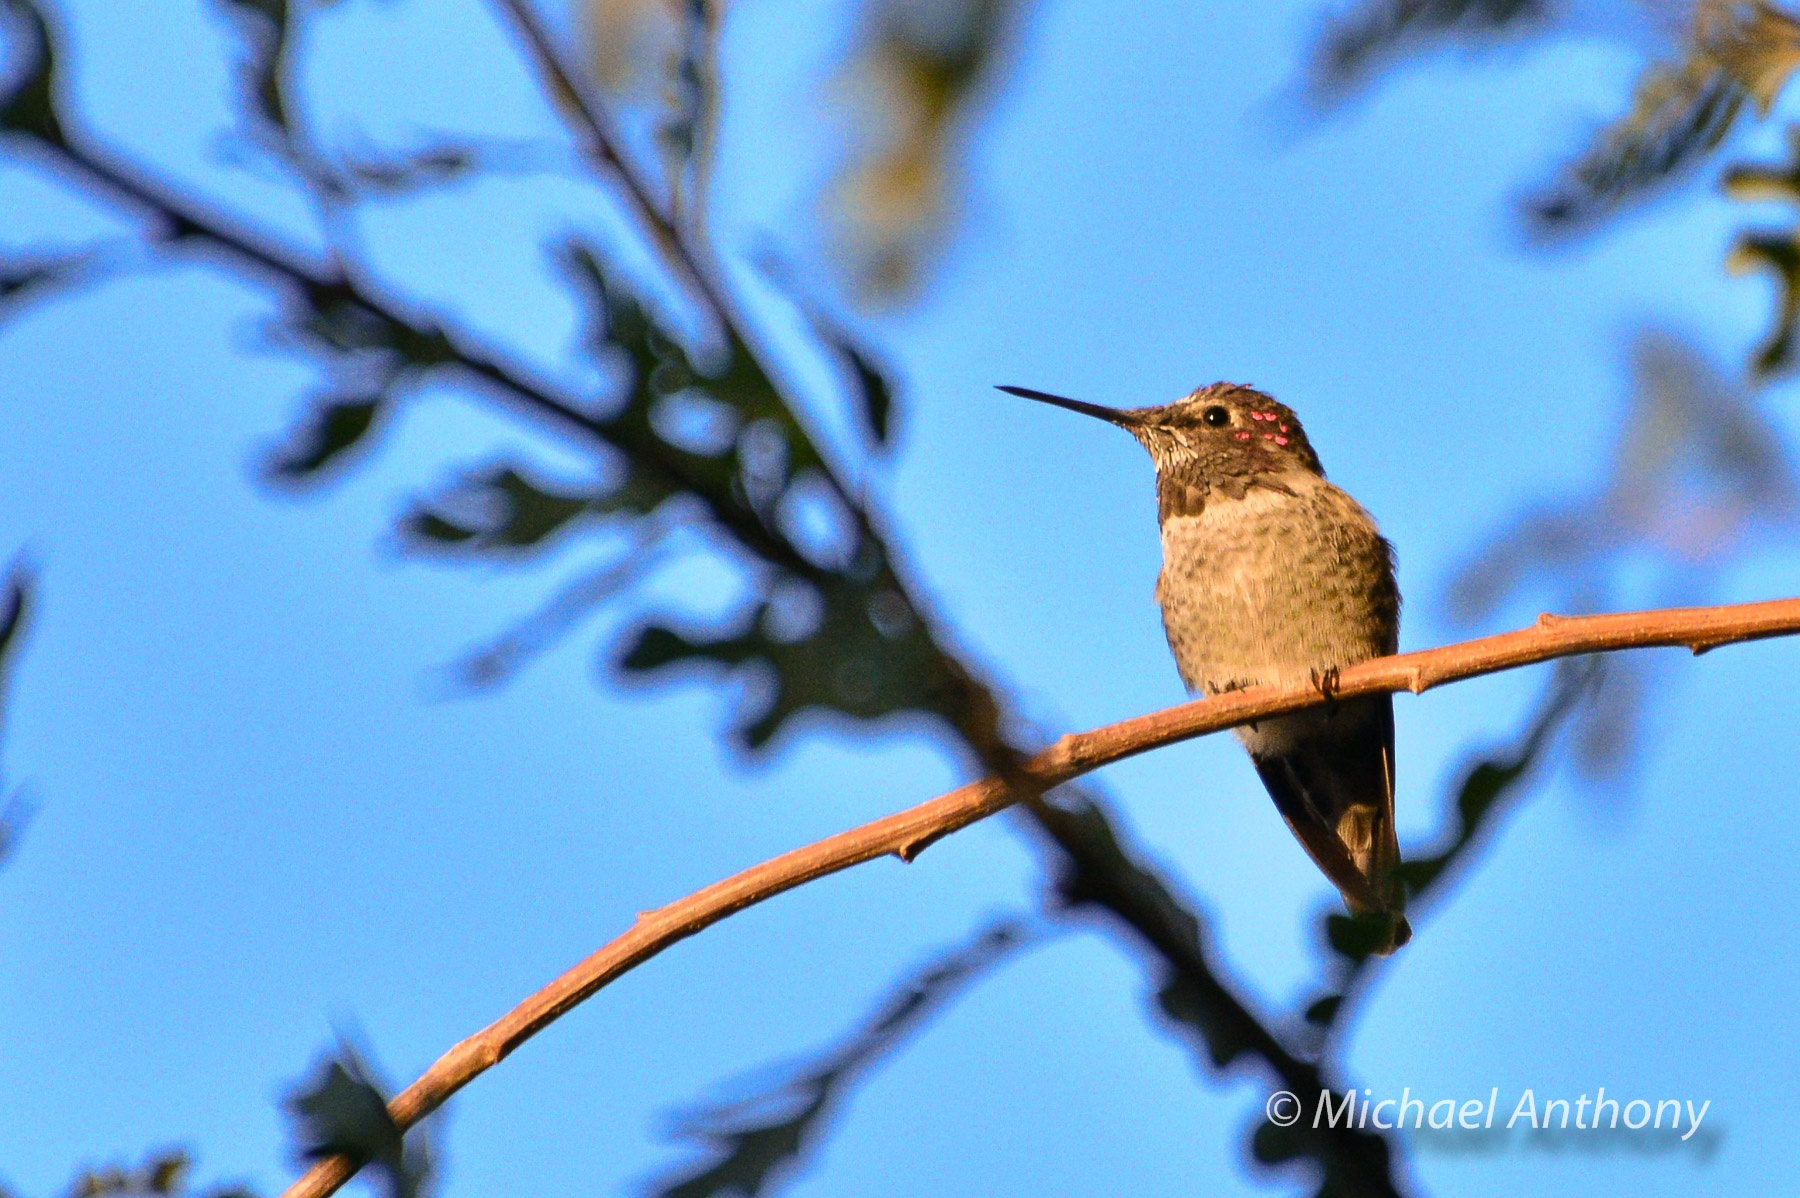 hummingbird diagram of color 1985 honda spree wiring how to photograph hummingbirds